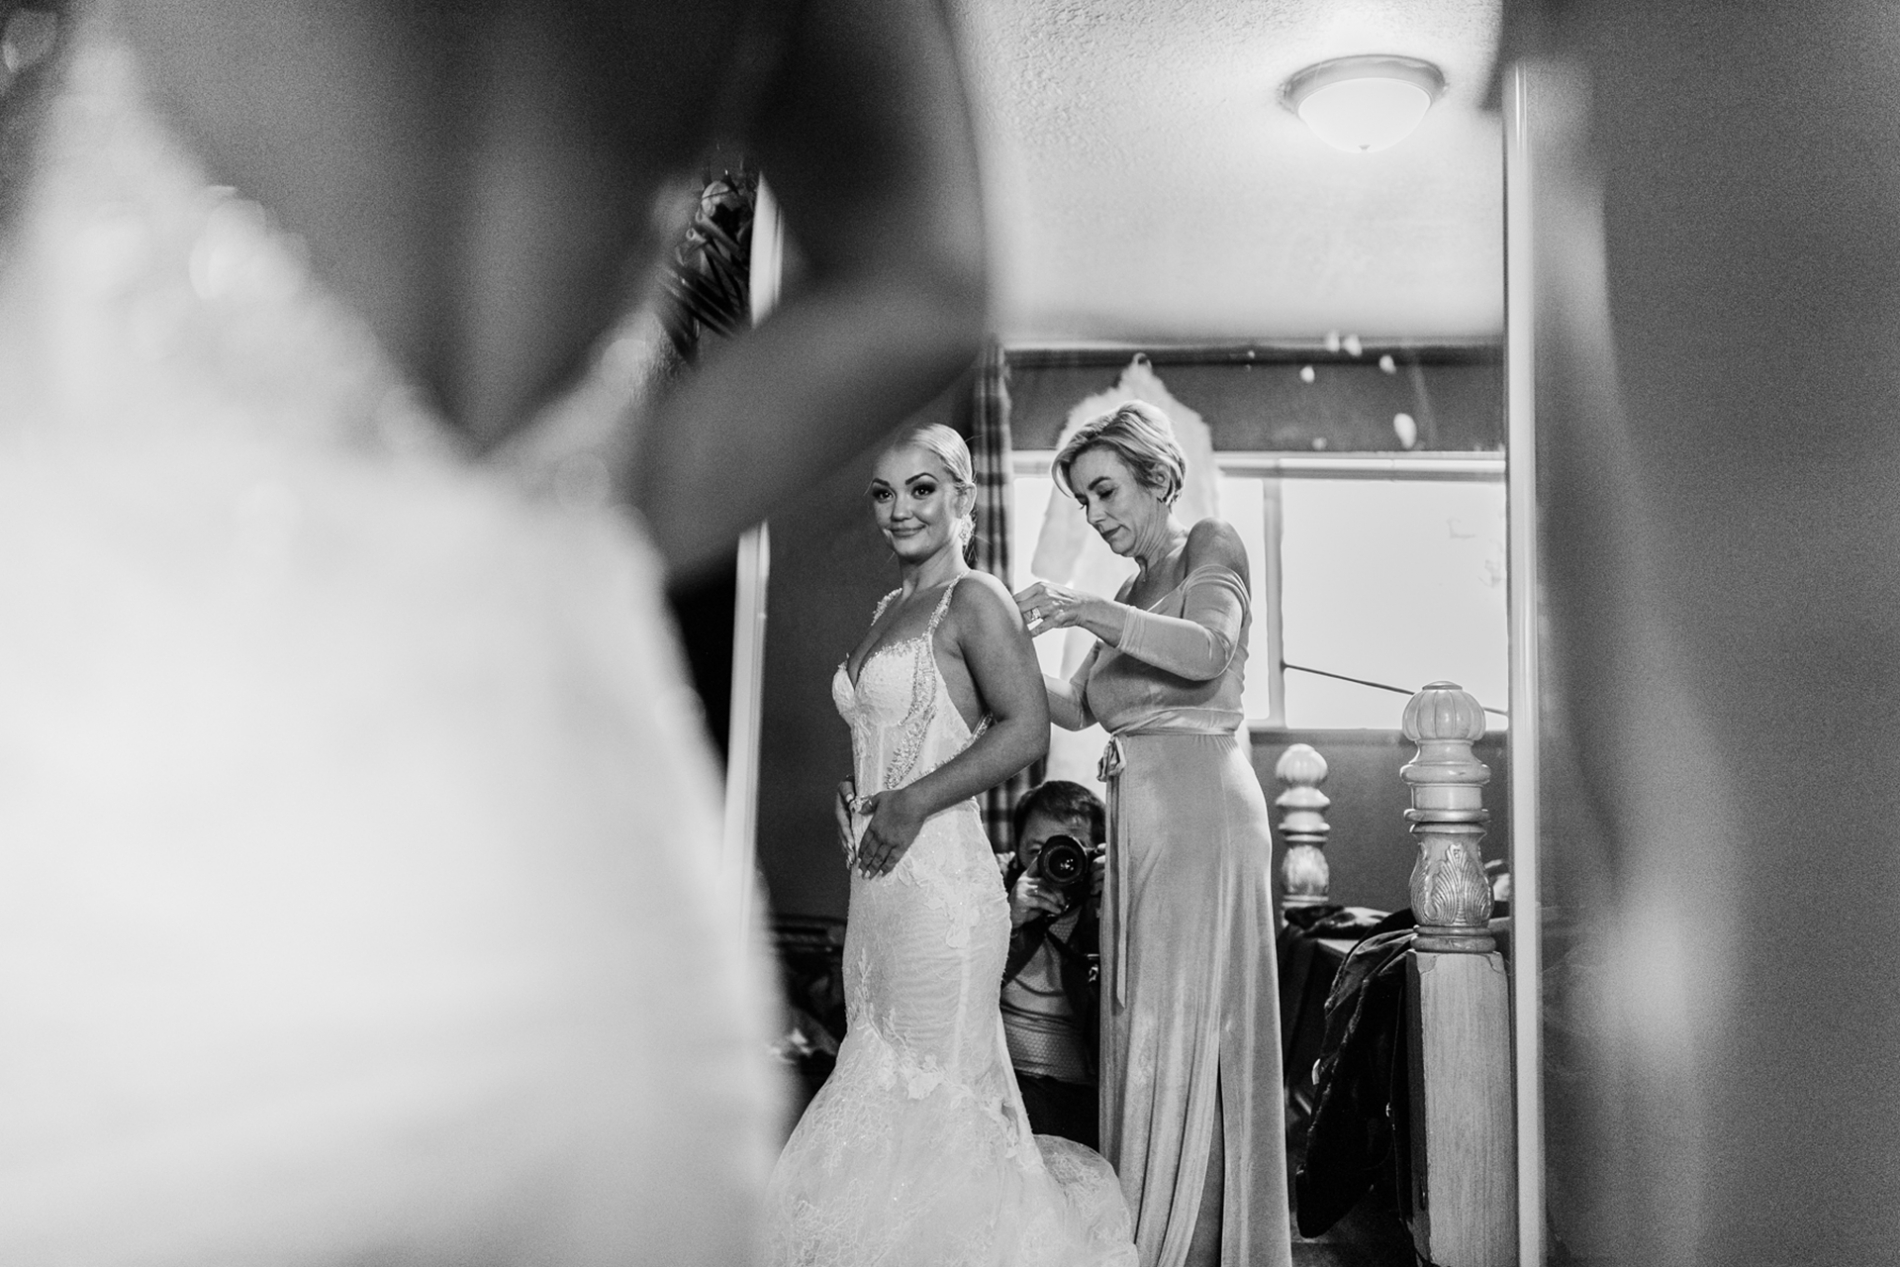 California San Jose wedding photographer self-portrait by Tyler Vu